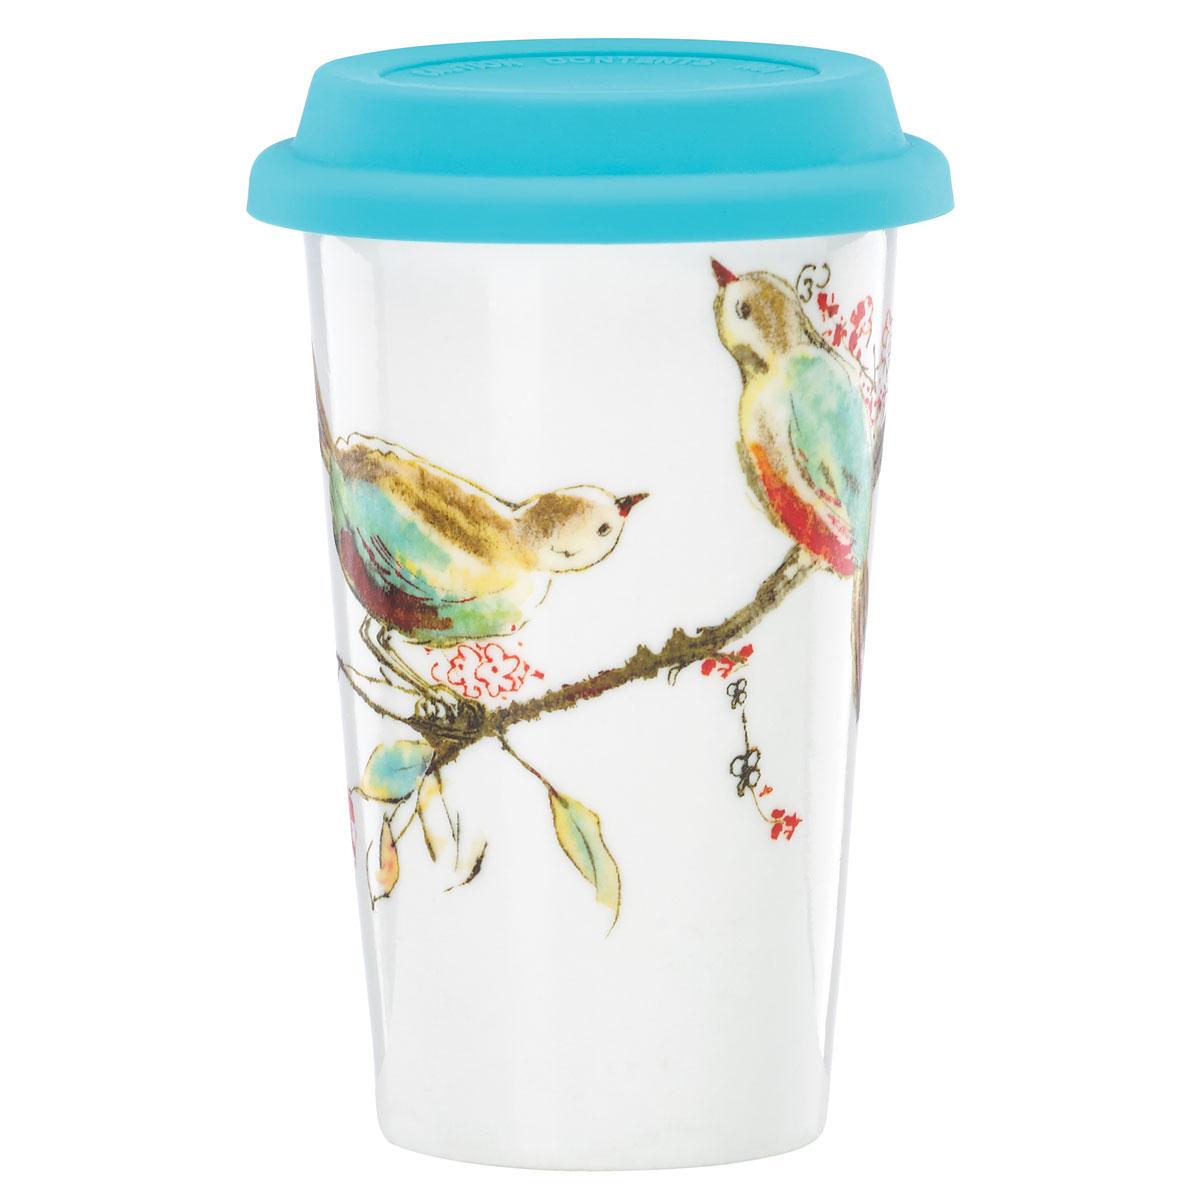 Lenox Chirp Dinnerware Thermal Travel Mug